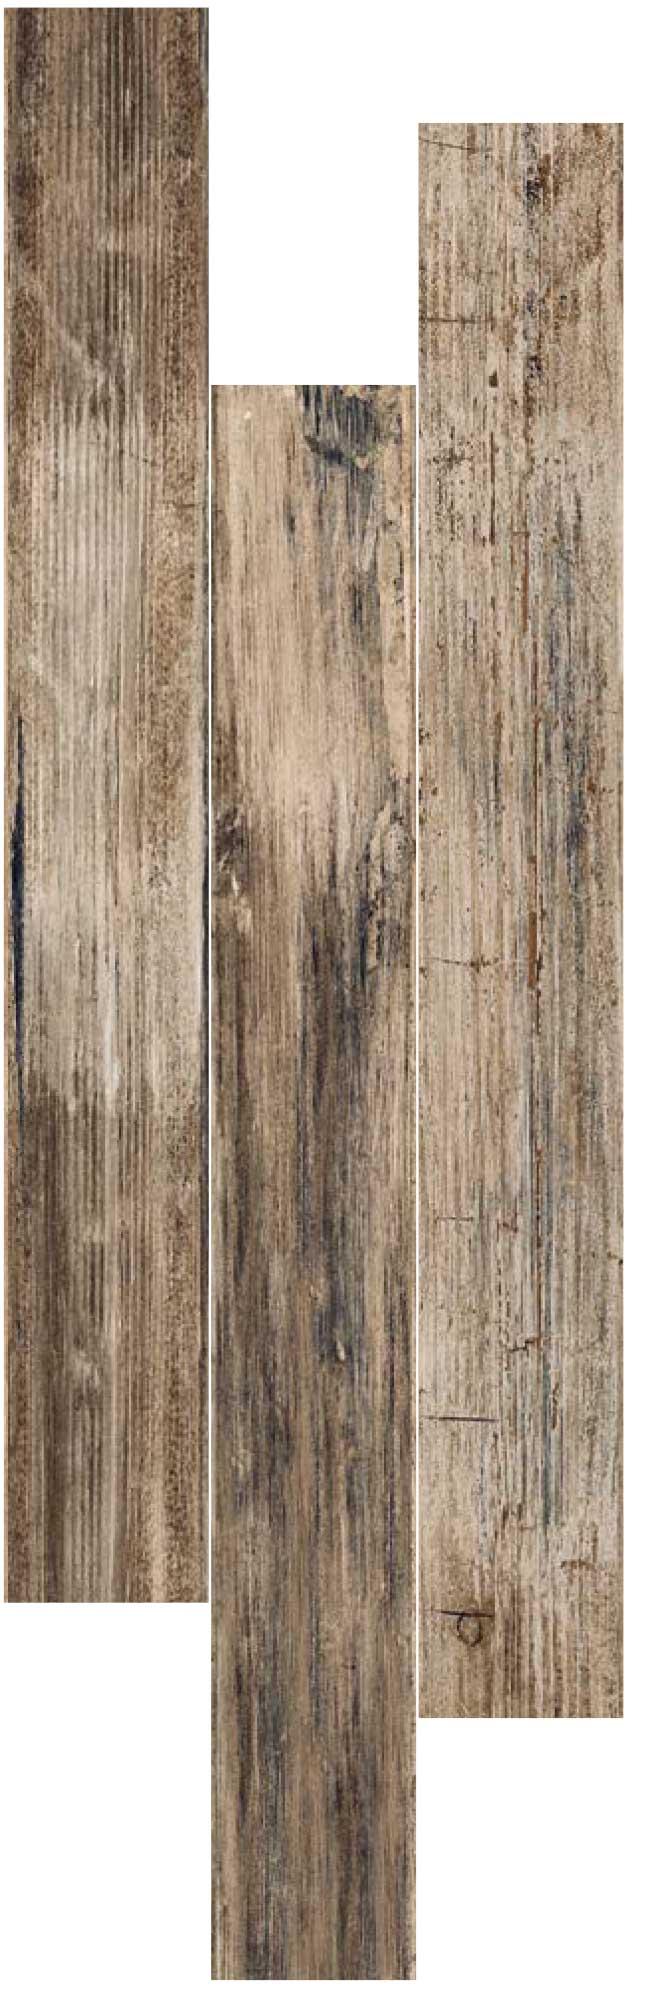 Sant Agostino Pictart Natural CSAPICNA15 Boden-/Wandfliese 120x15